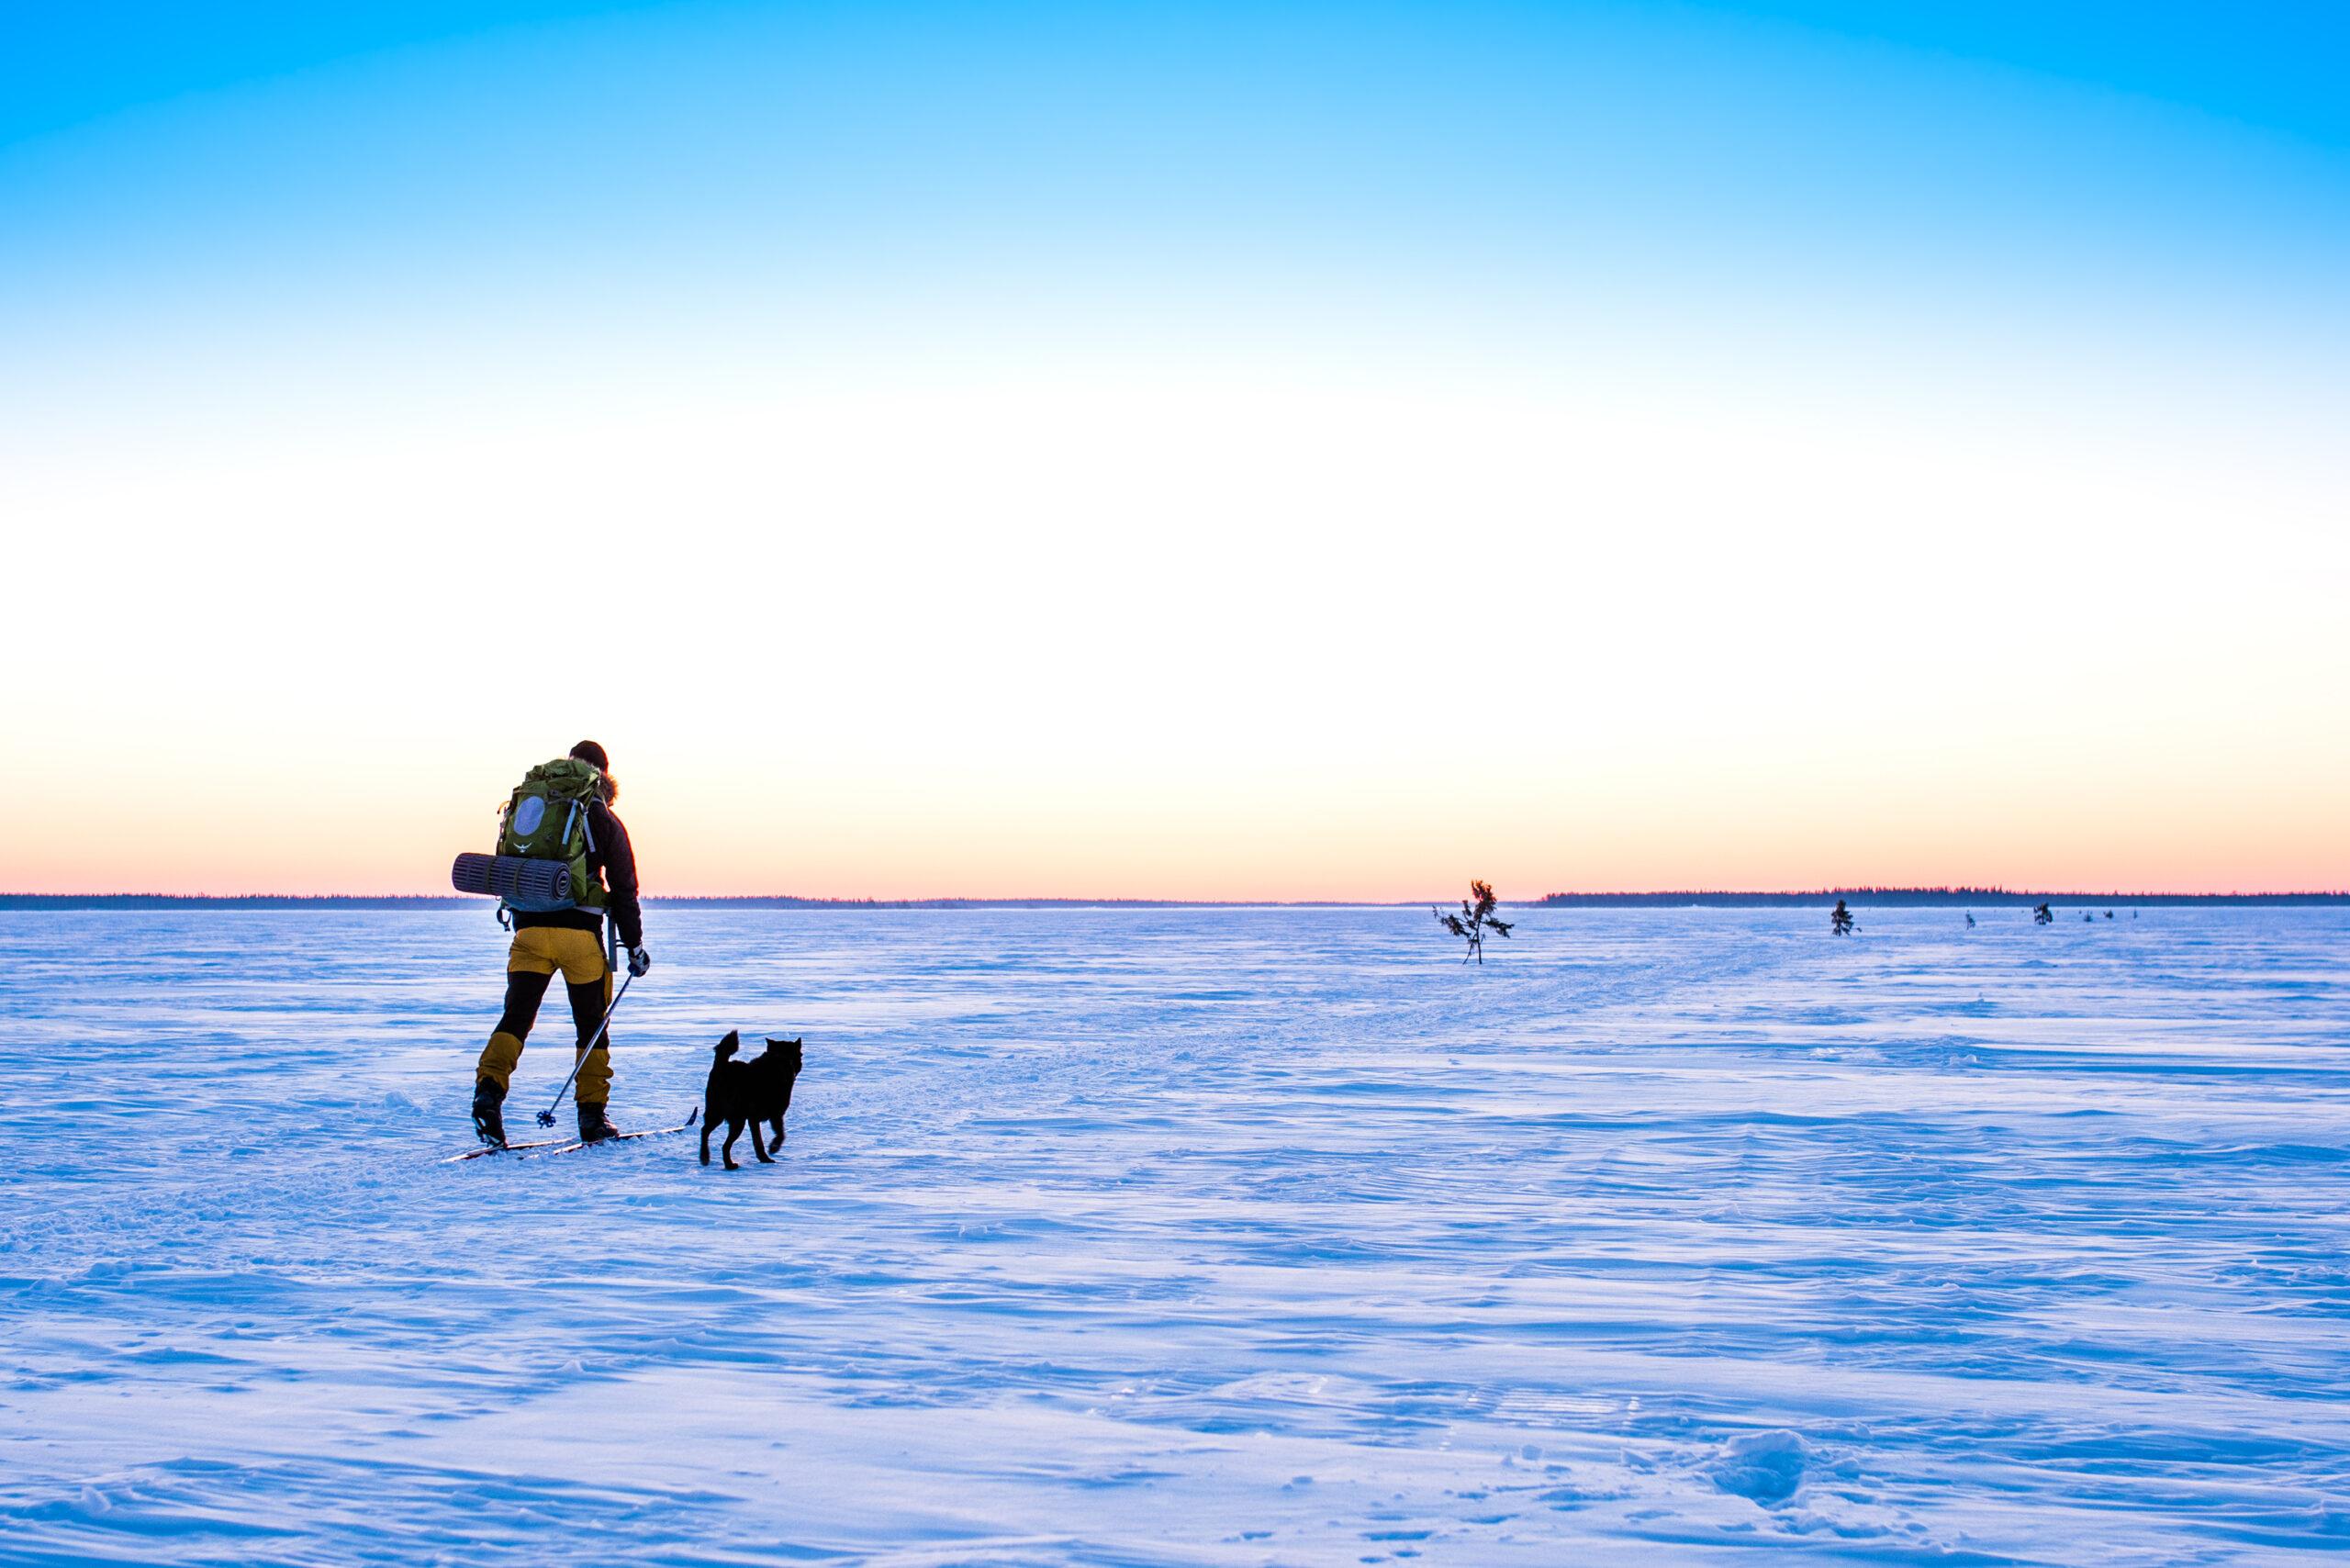 Vintertur på skidor. Lövskär, Luleå.